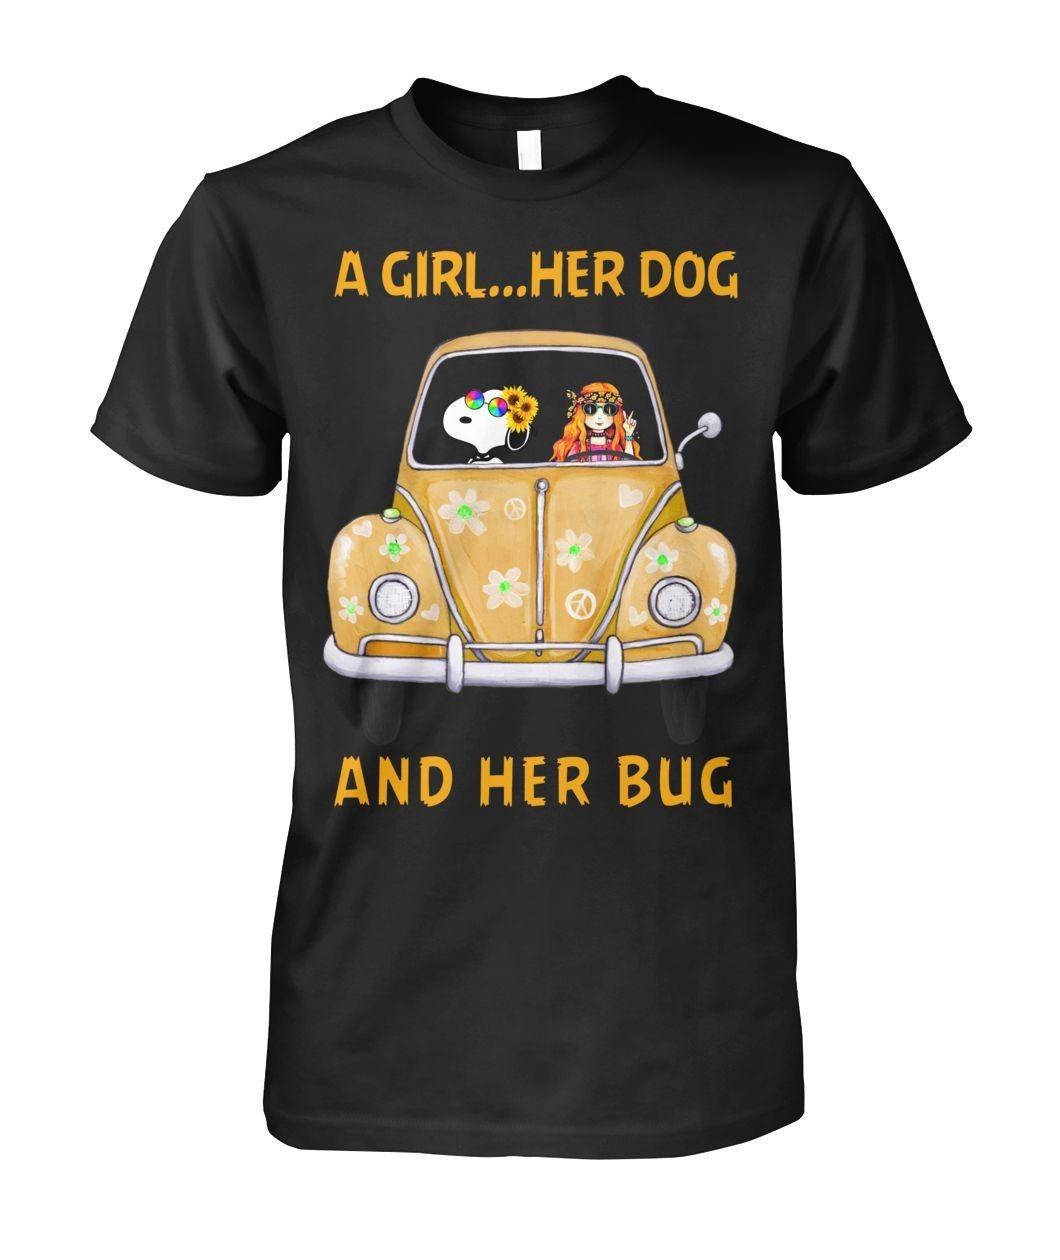 A girl her dog and her bug shirt